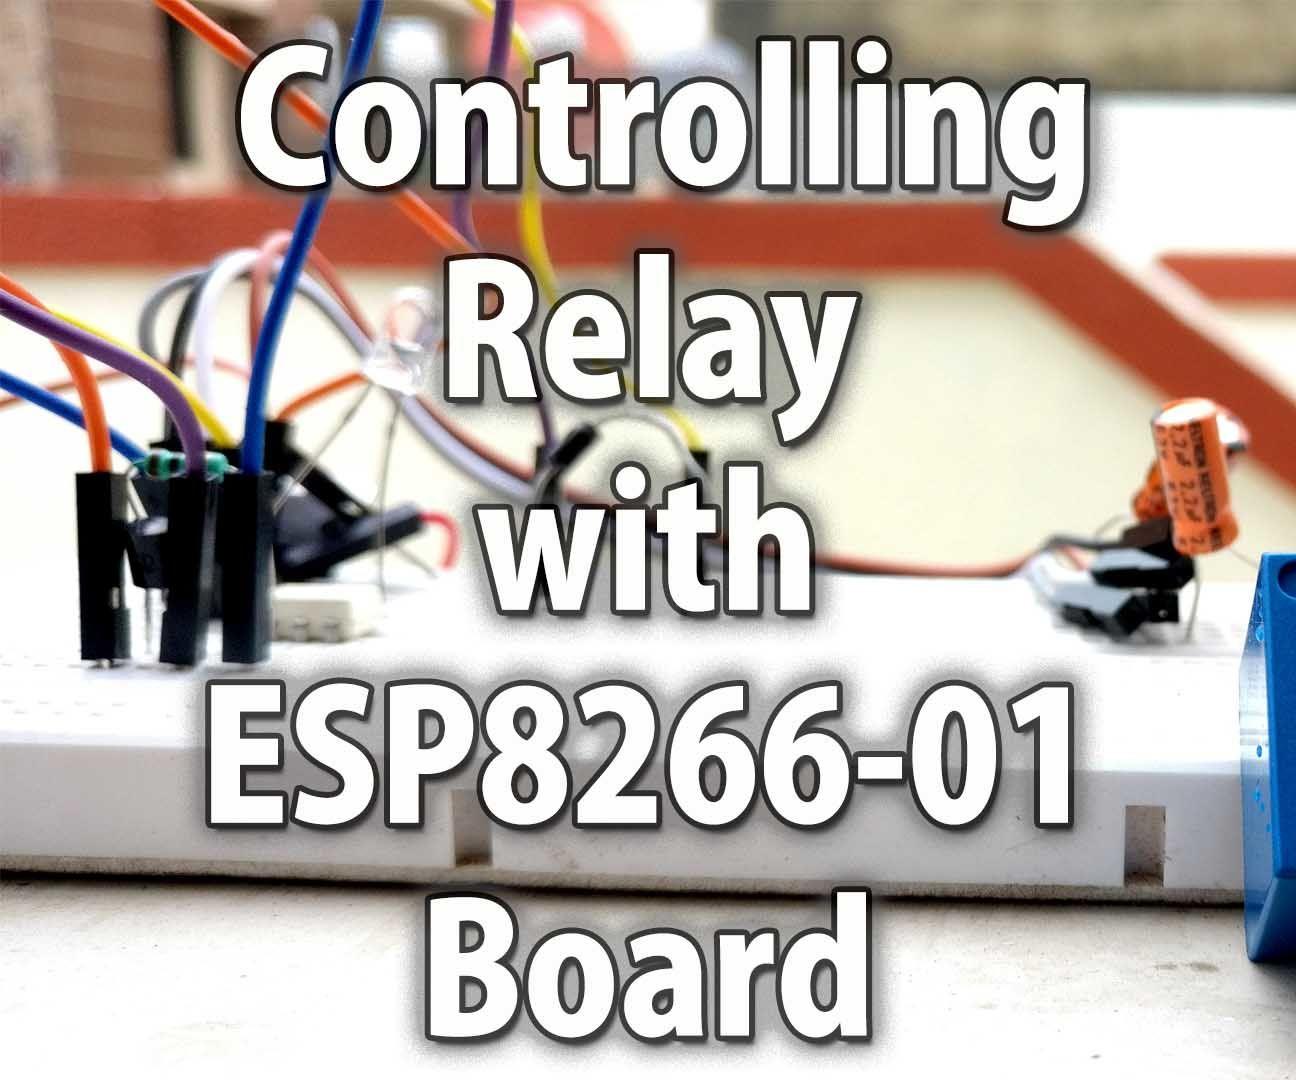 Control a Relay With Esp8266 Module